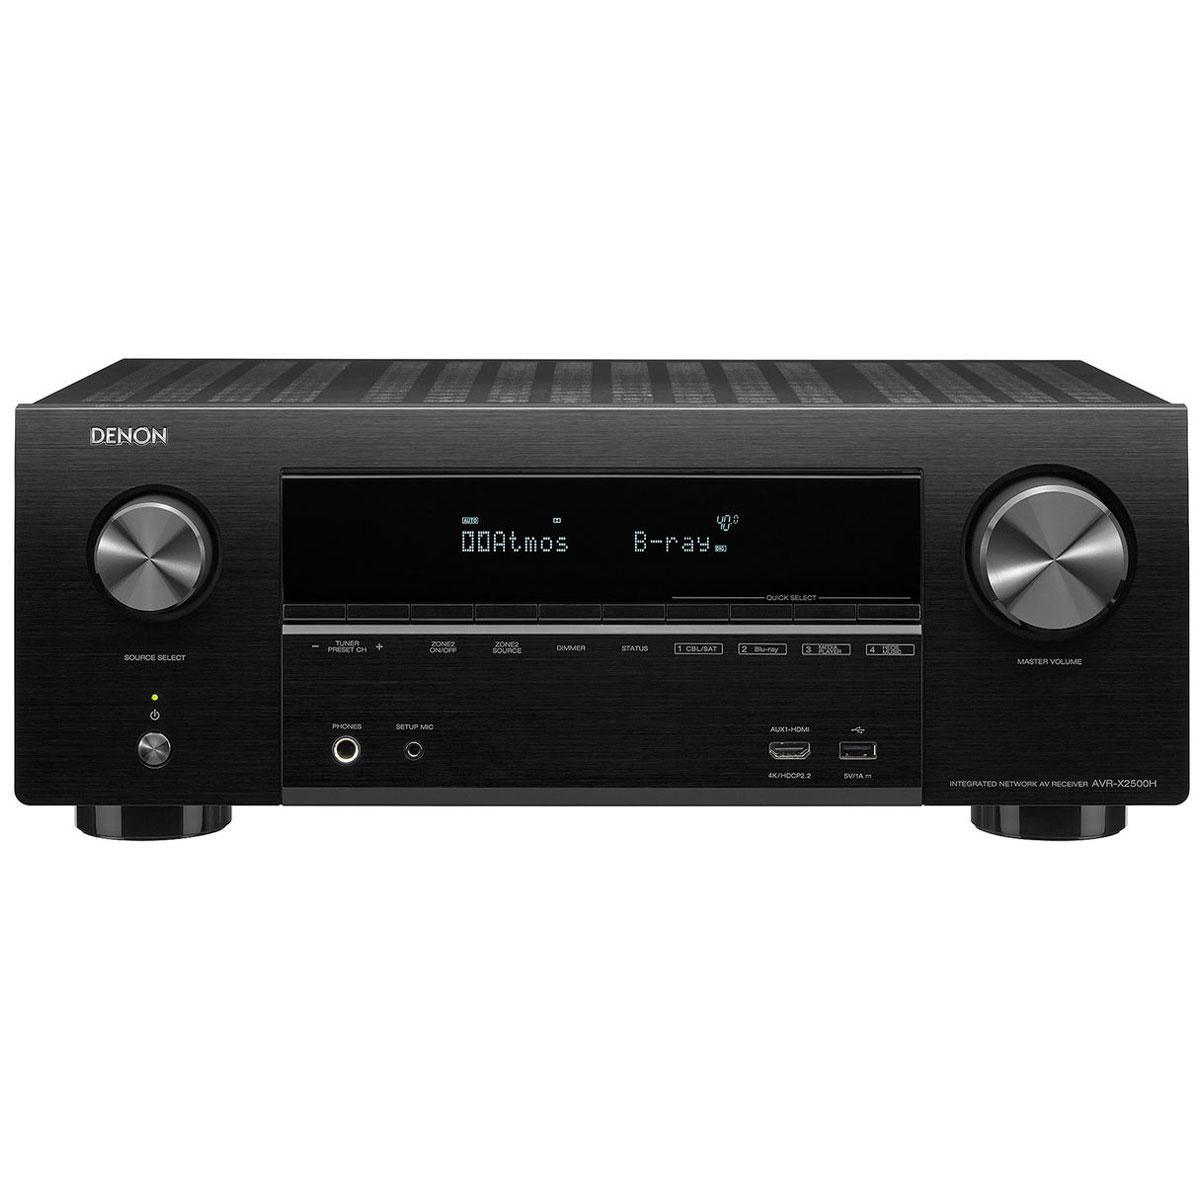 Ampli home cinéma Denon AVR-X2500H Noir Ampli-tuner Home Cinema 3D Ready 7.2 - Dolby Atmos / DTS:X - 8x HDMI 4K Ultra HD, HDCP 2.2, HDR - Wi-Fi, Bluetooth, AirPlay 2 - Multiroom - Amazon Alexa